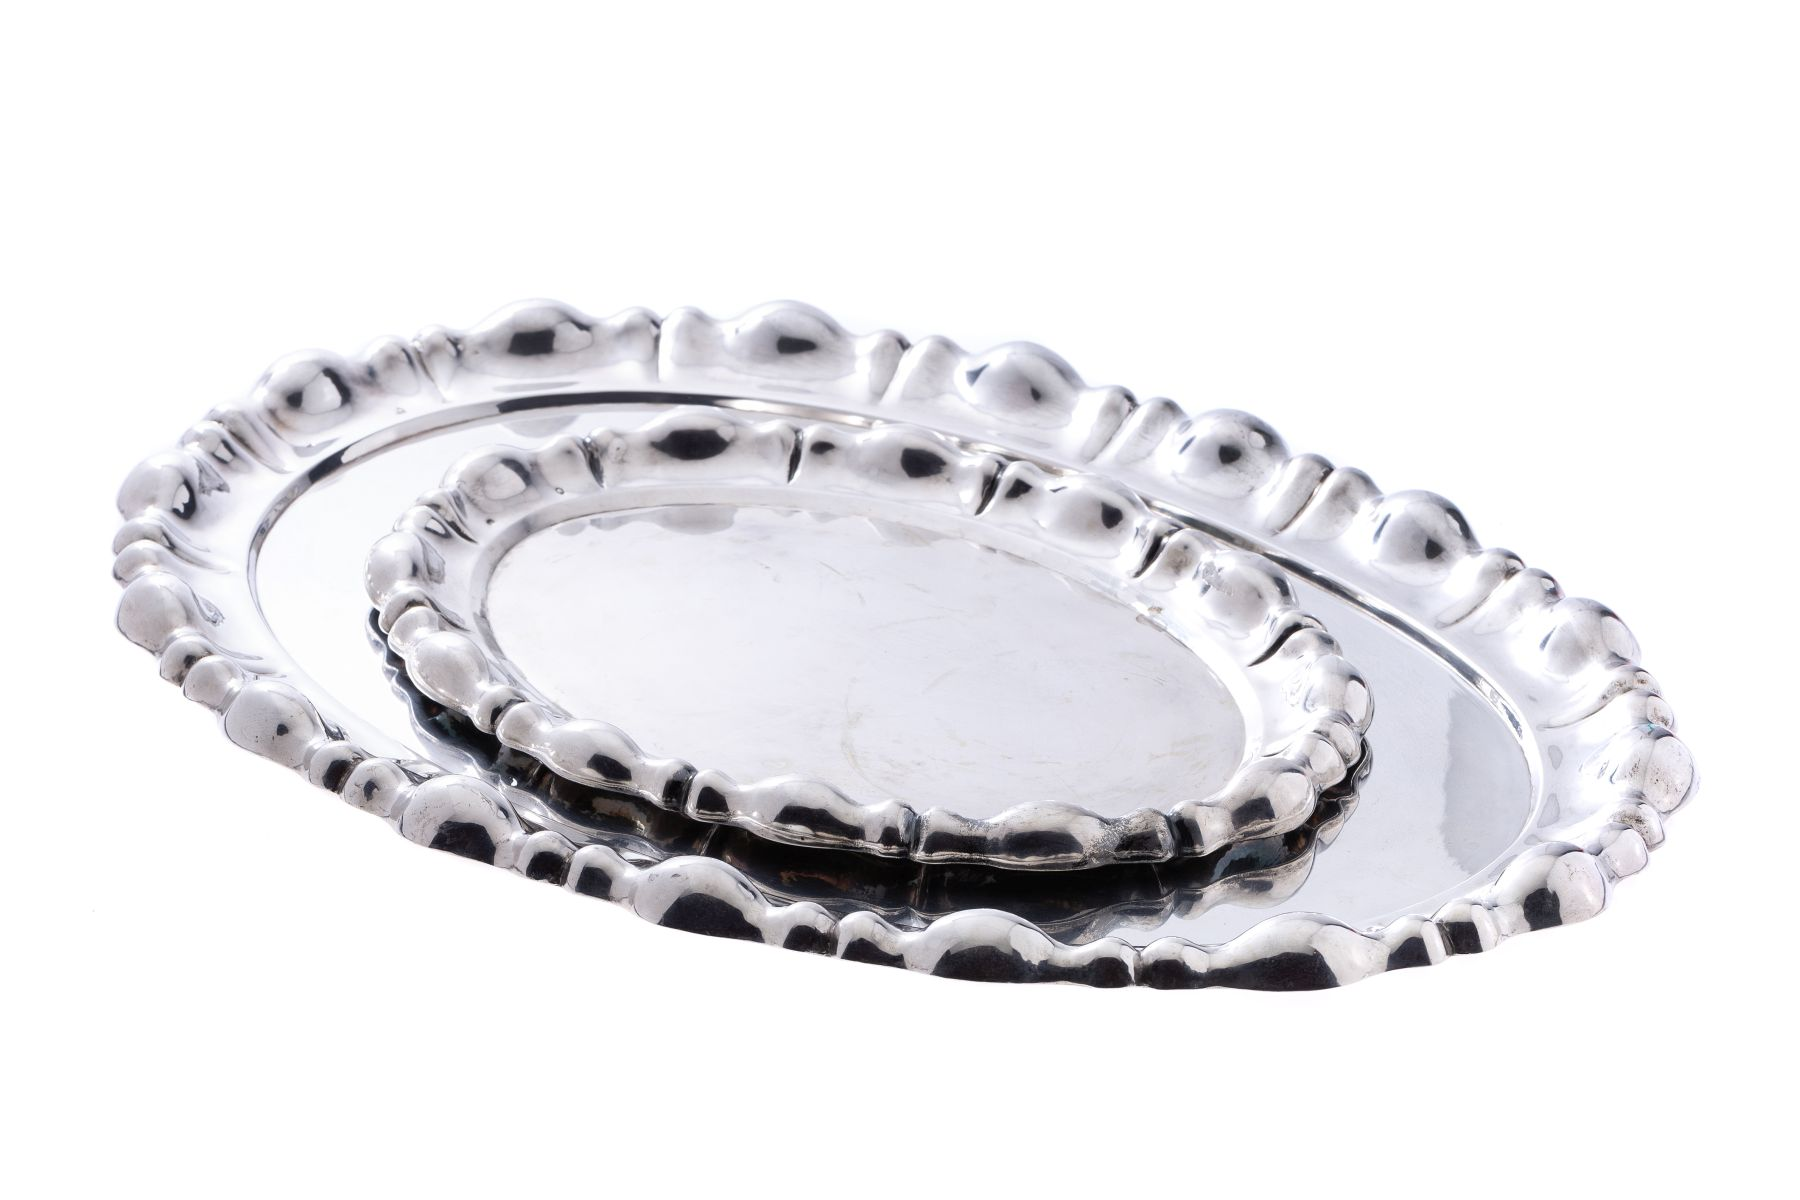 #17 2 silver plates | 2 Silberplatten Image